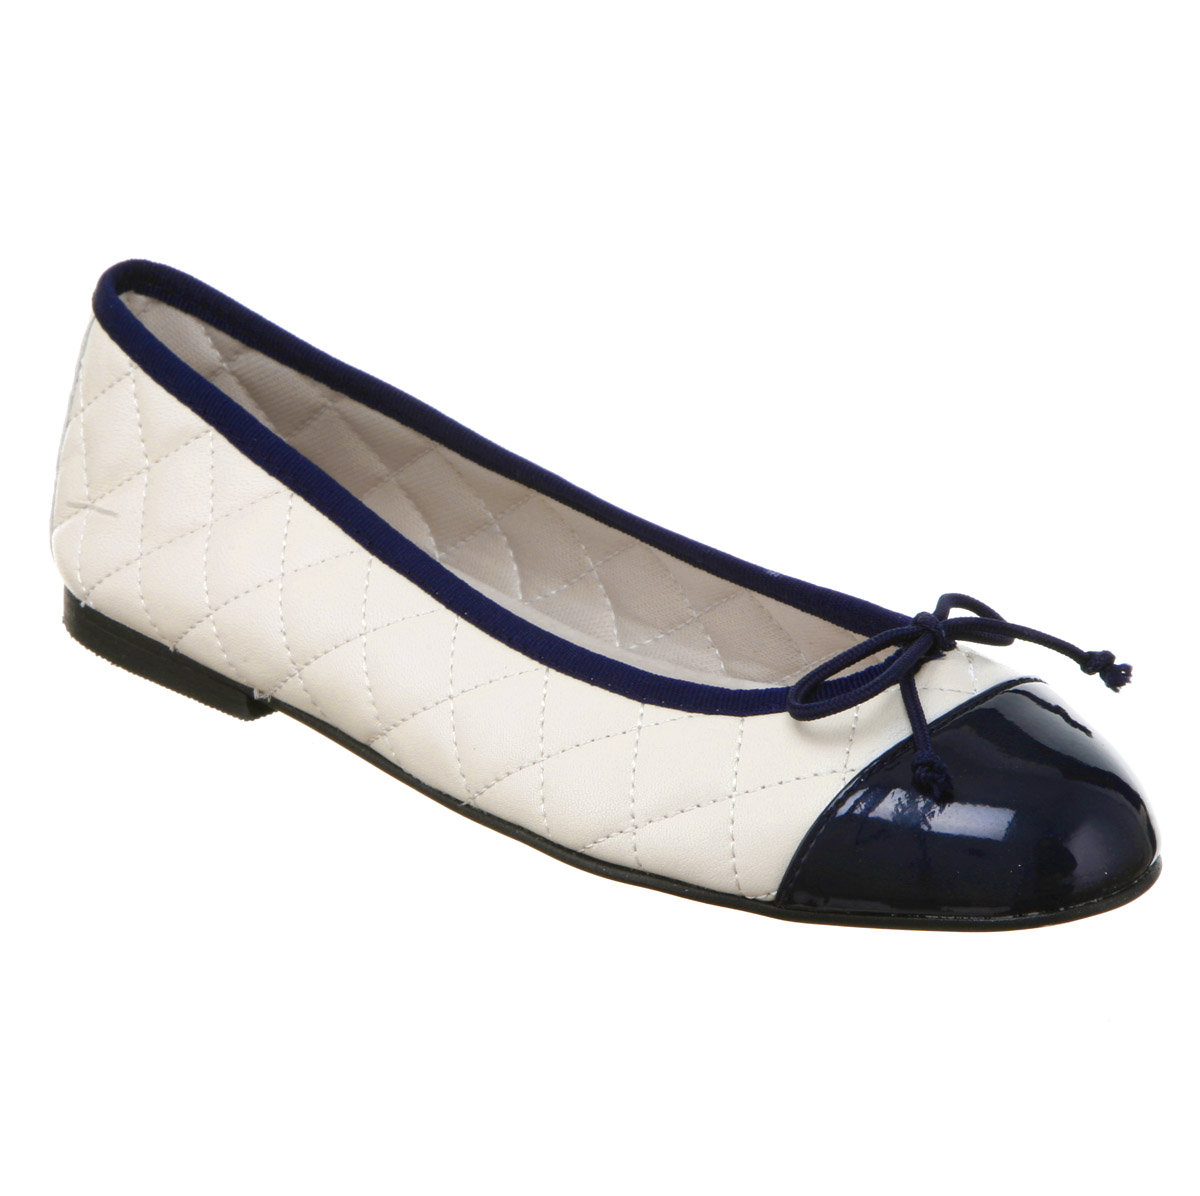 0c96f516d Womens Office Girl Cecilia Toe-cap Ballerina Navy Blue Patent cream ...